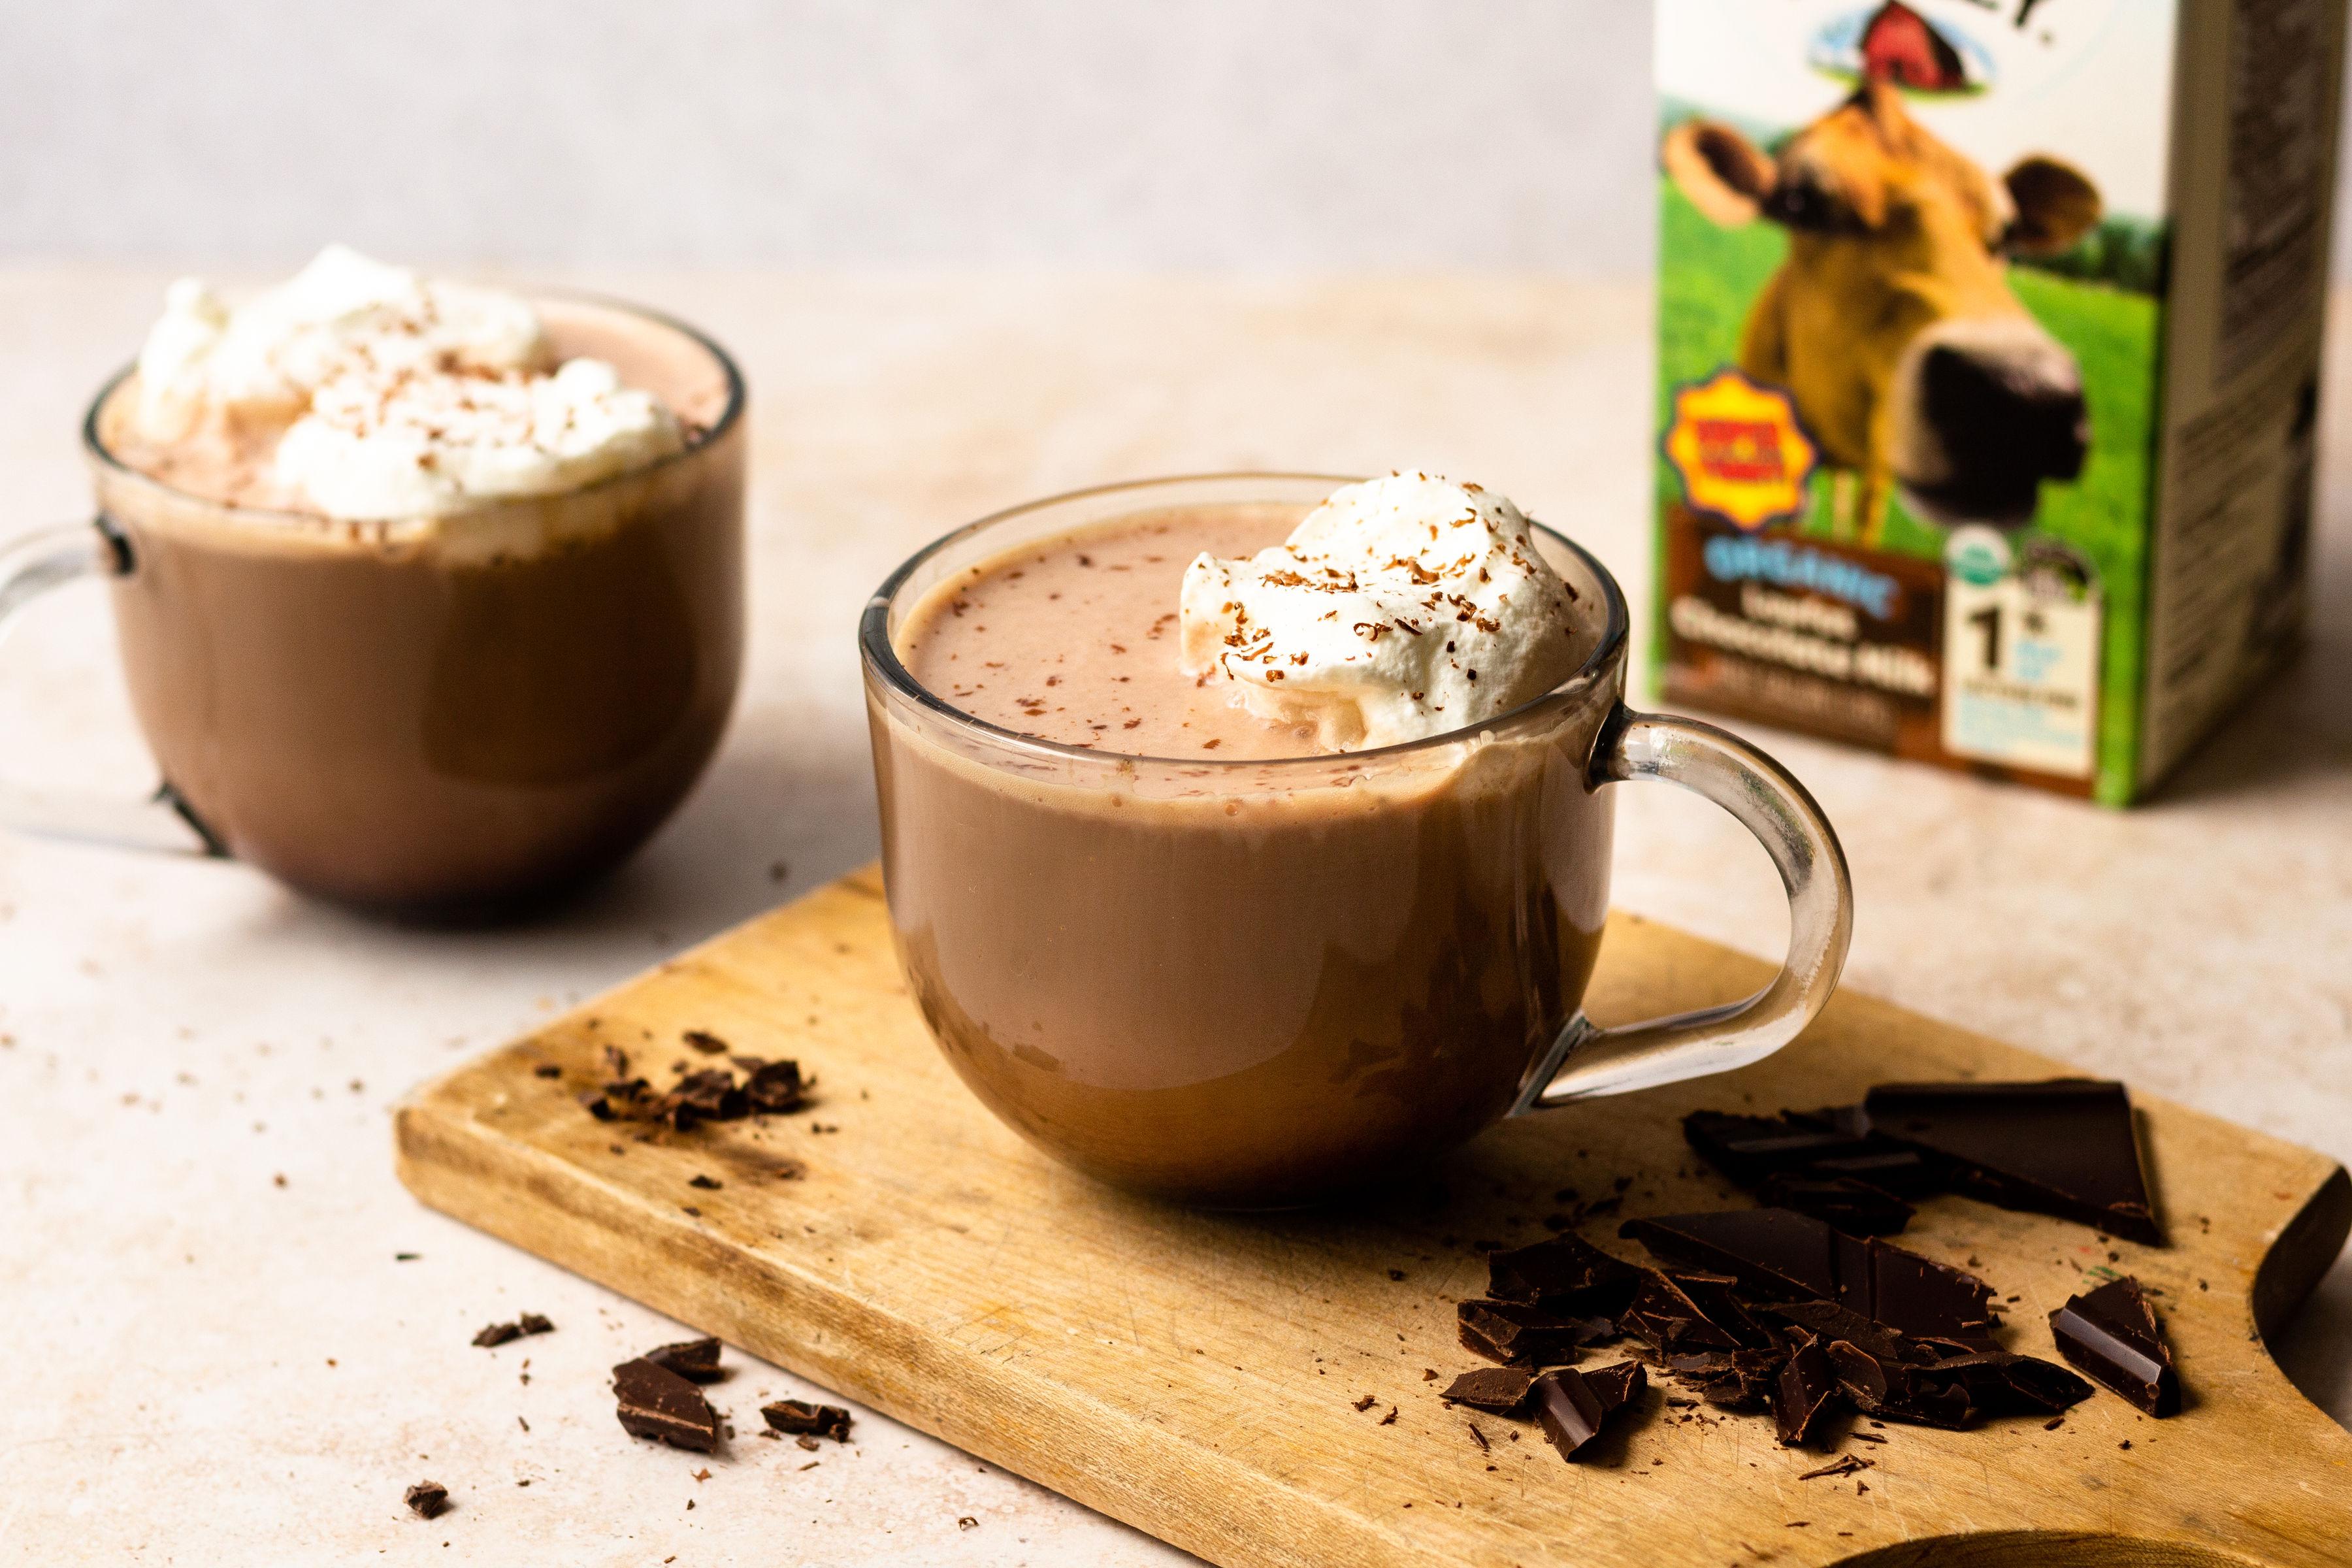 Dark chocolate mocha with Organic Valley Lowfat Chocolate Milk.